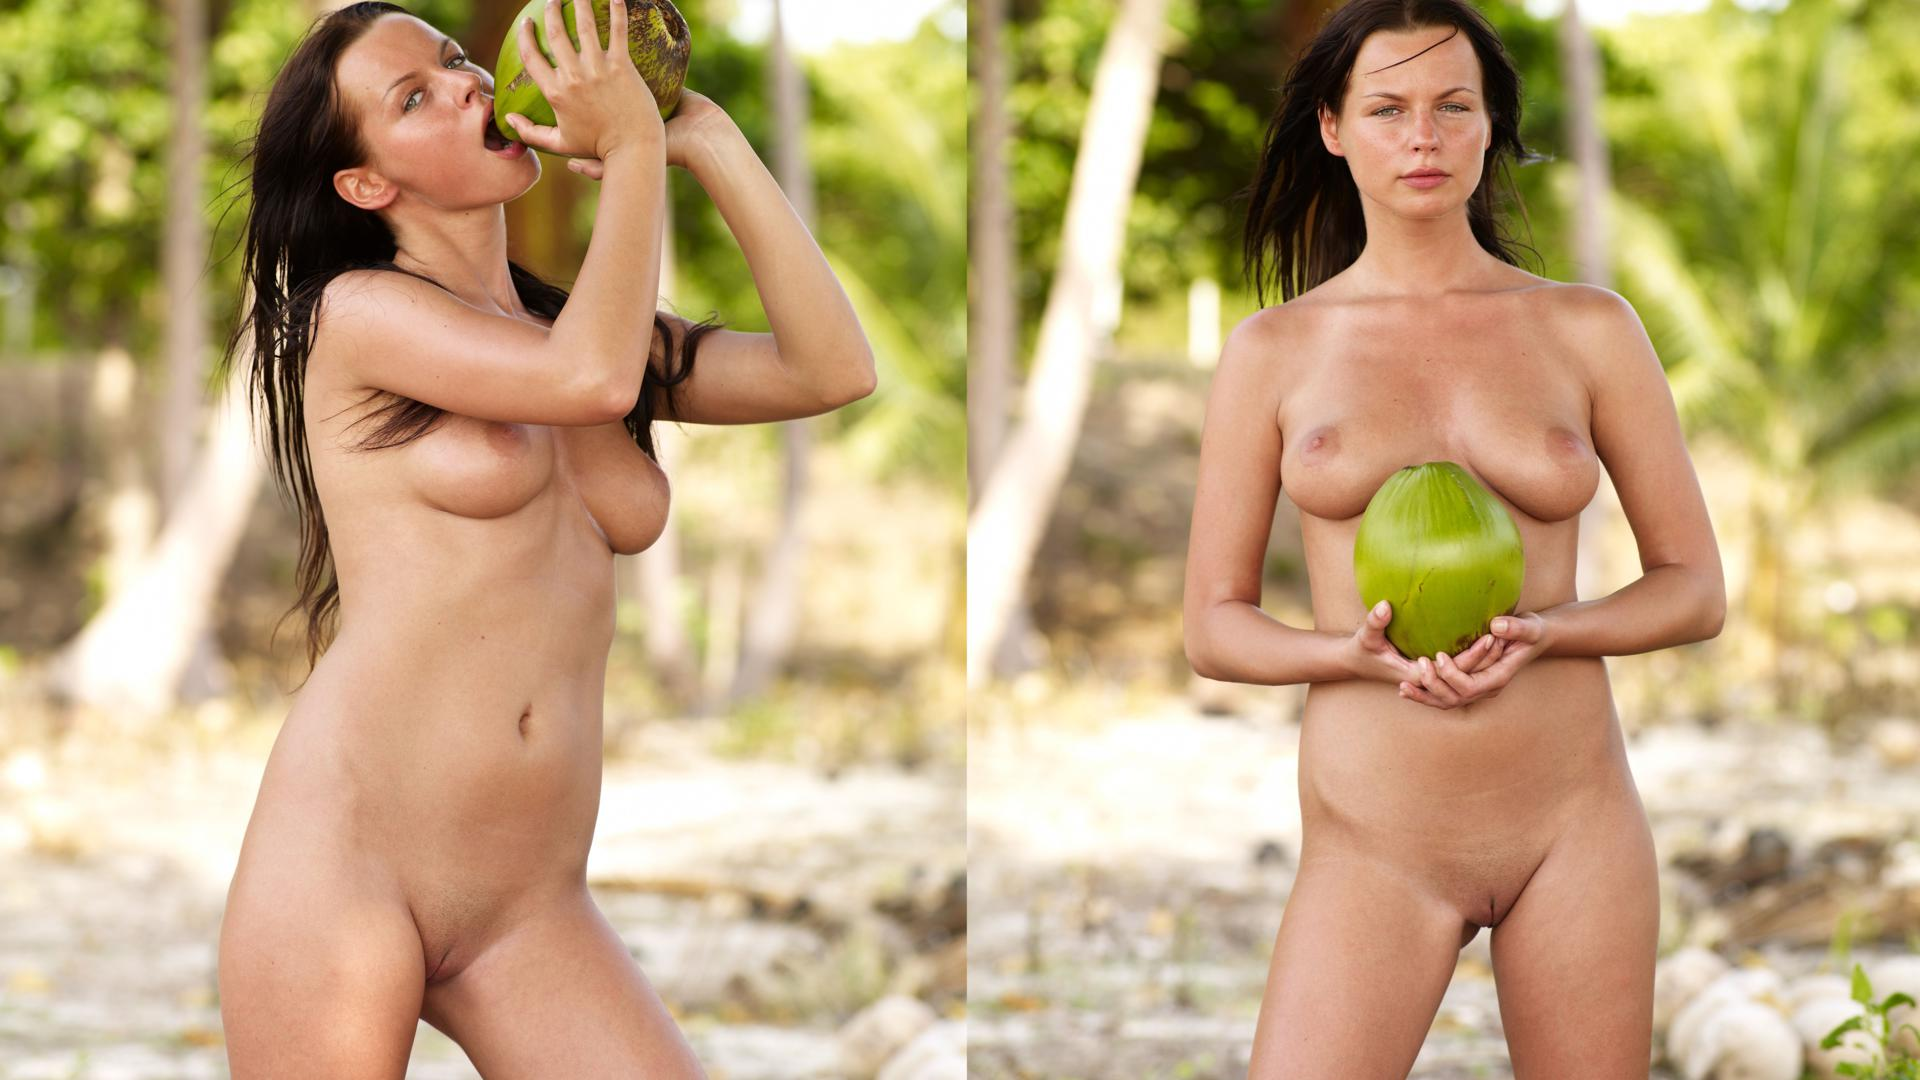 coconut boobs